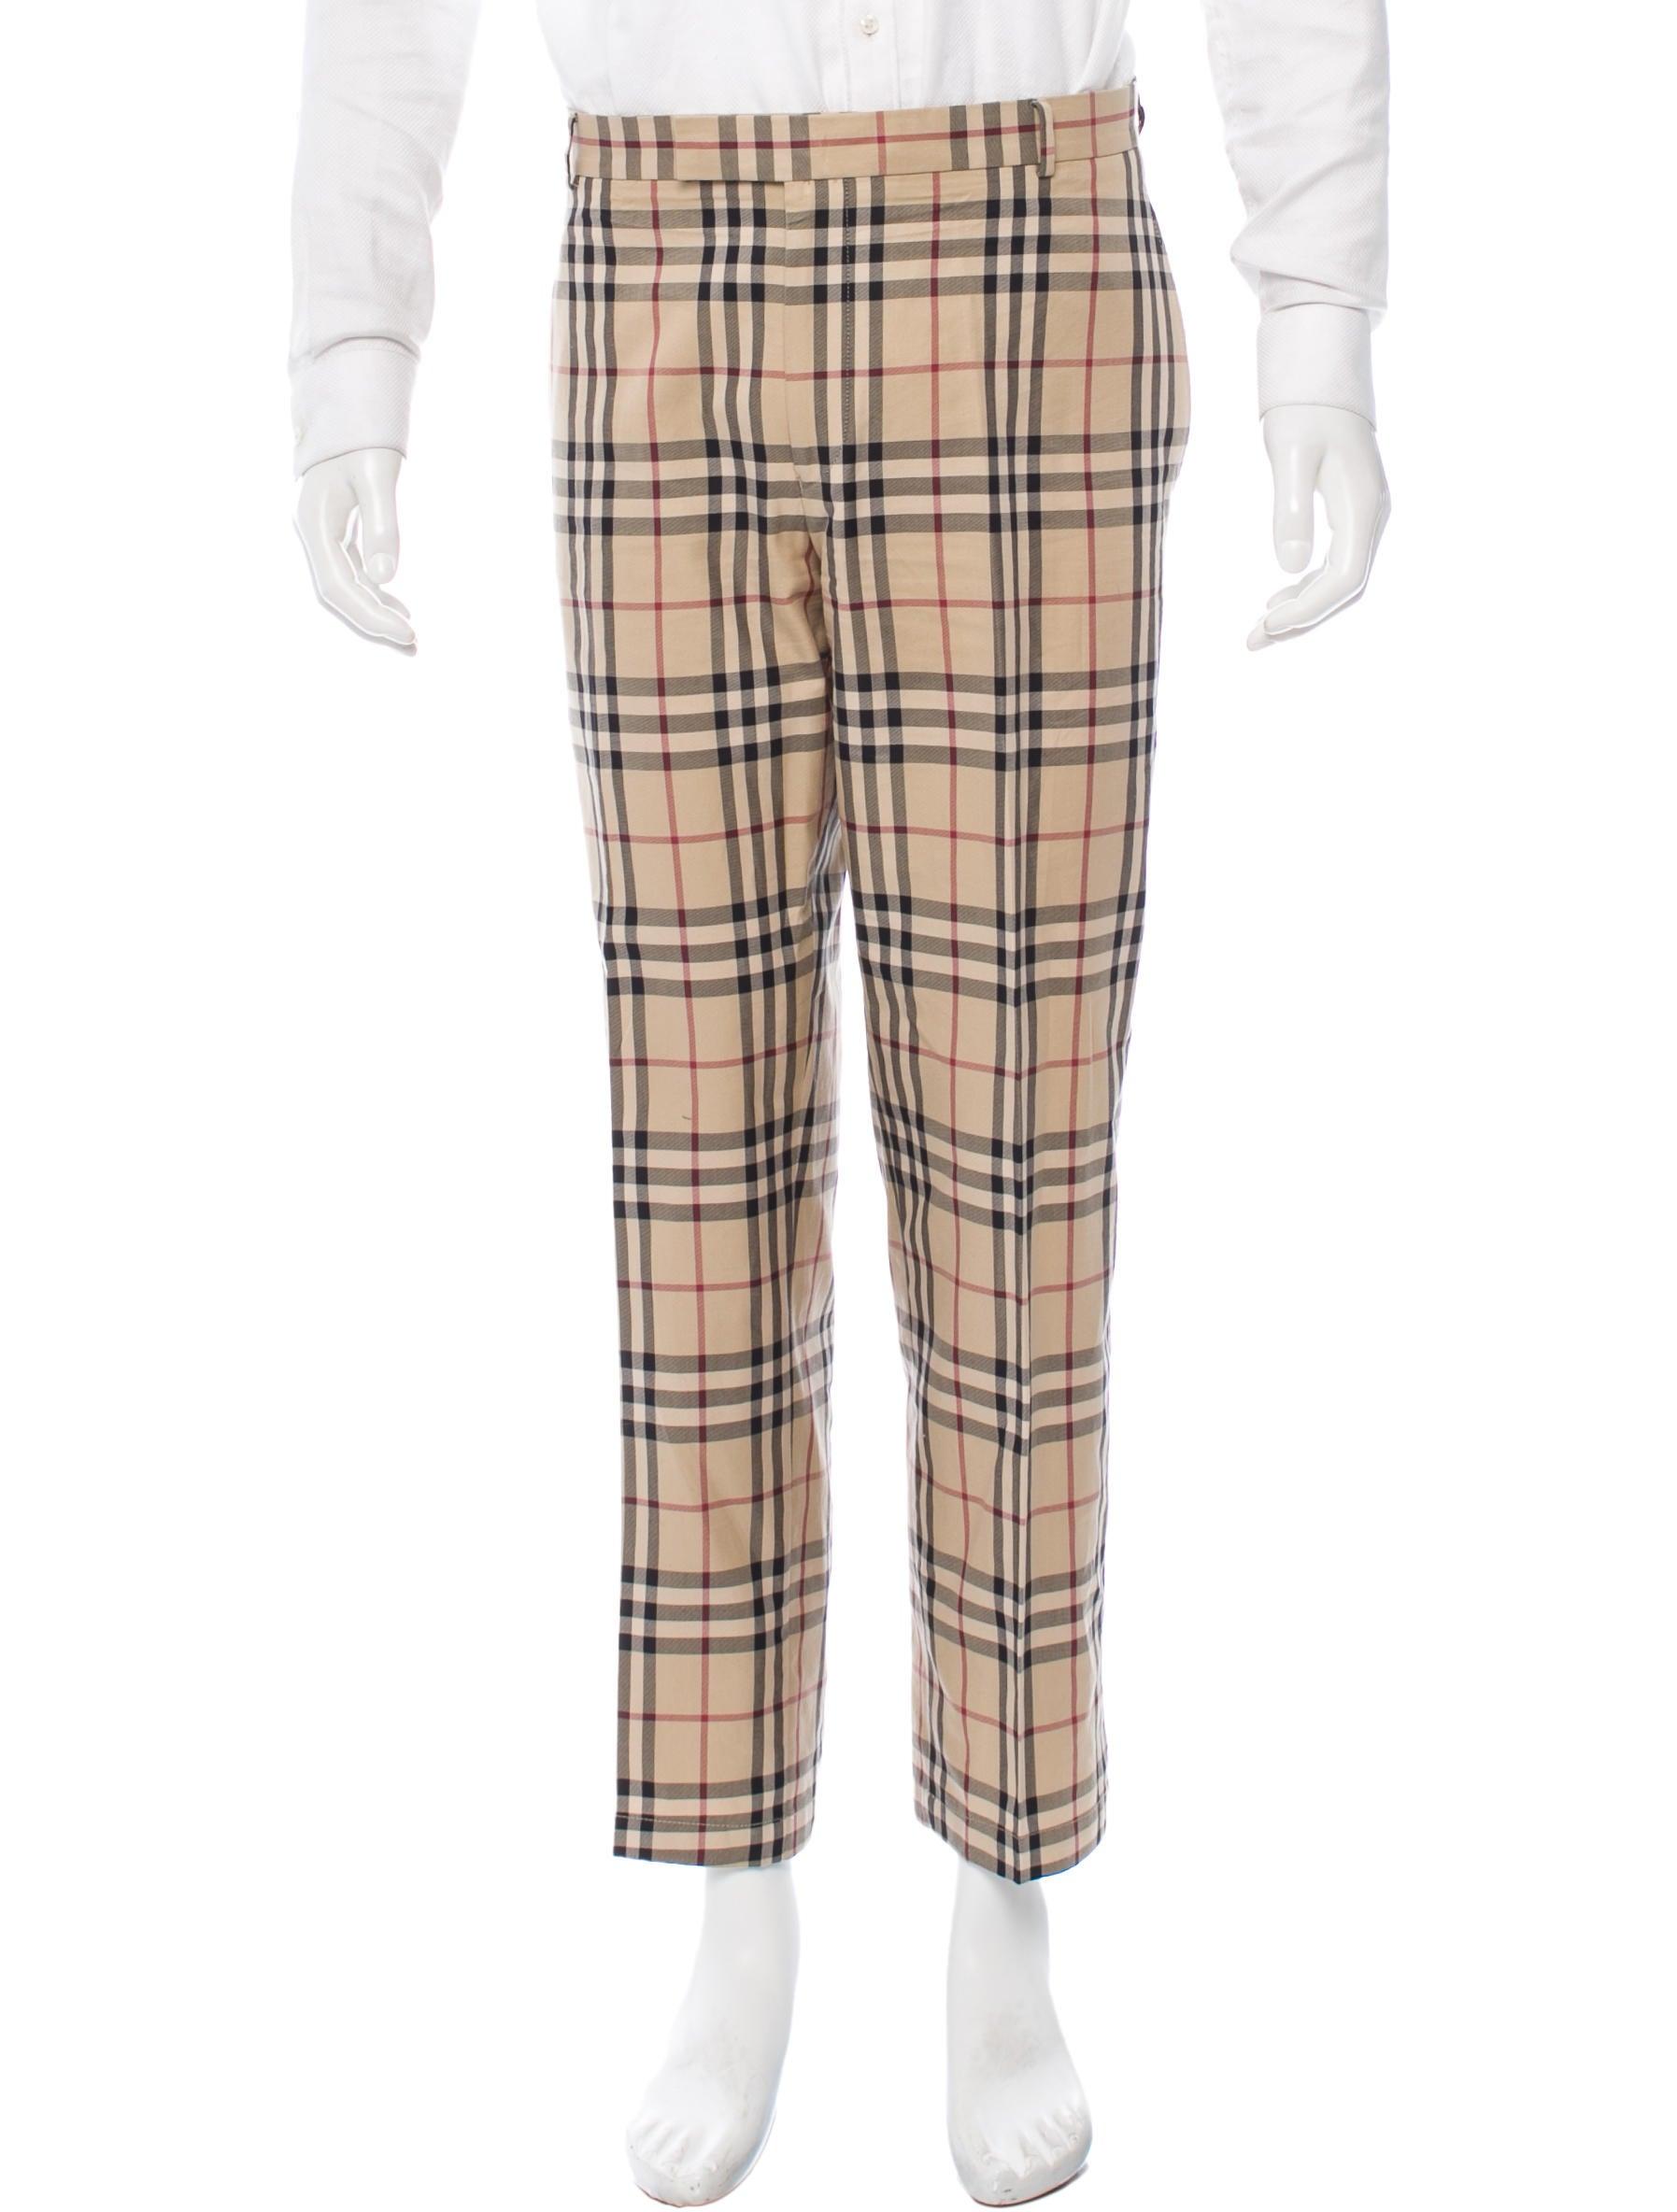 Burberry Nova Check Flat Front Pants Clothing Bur46216